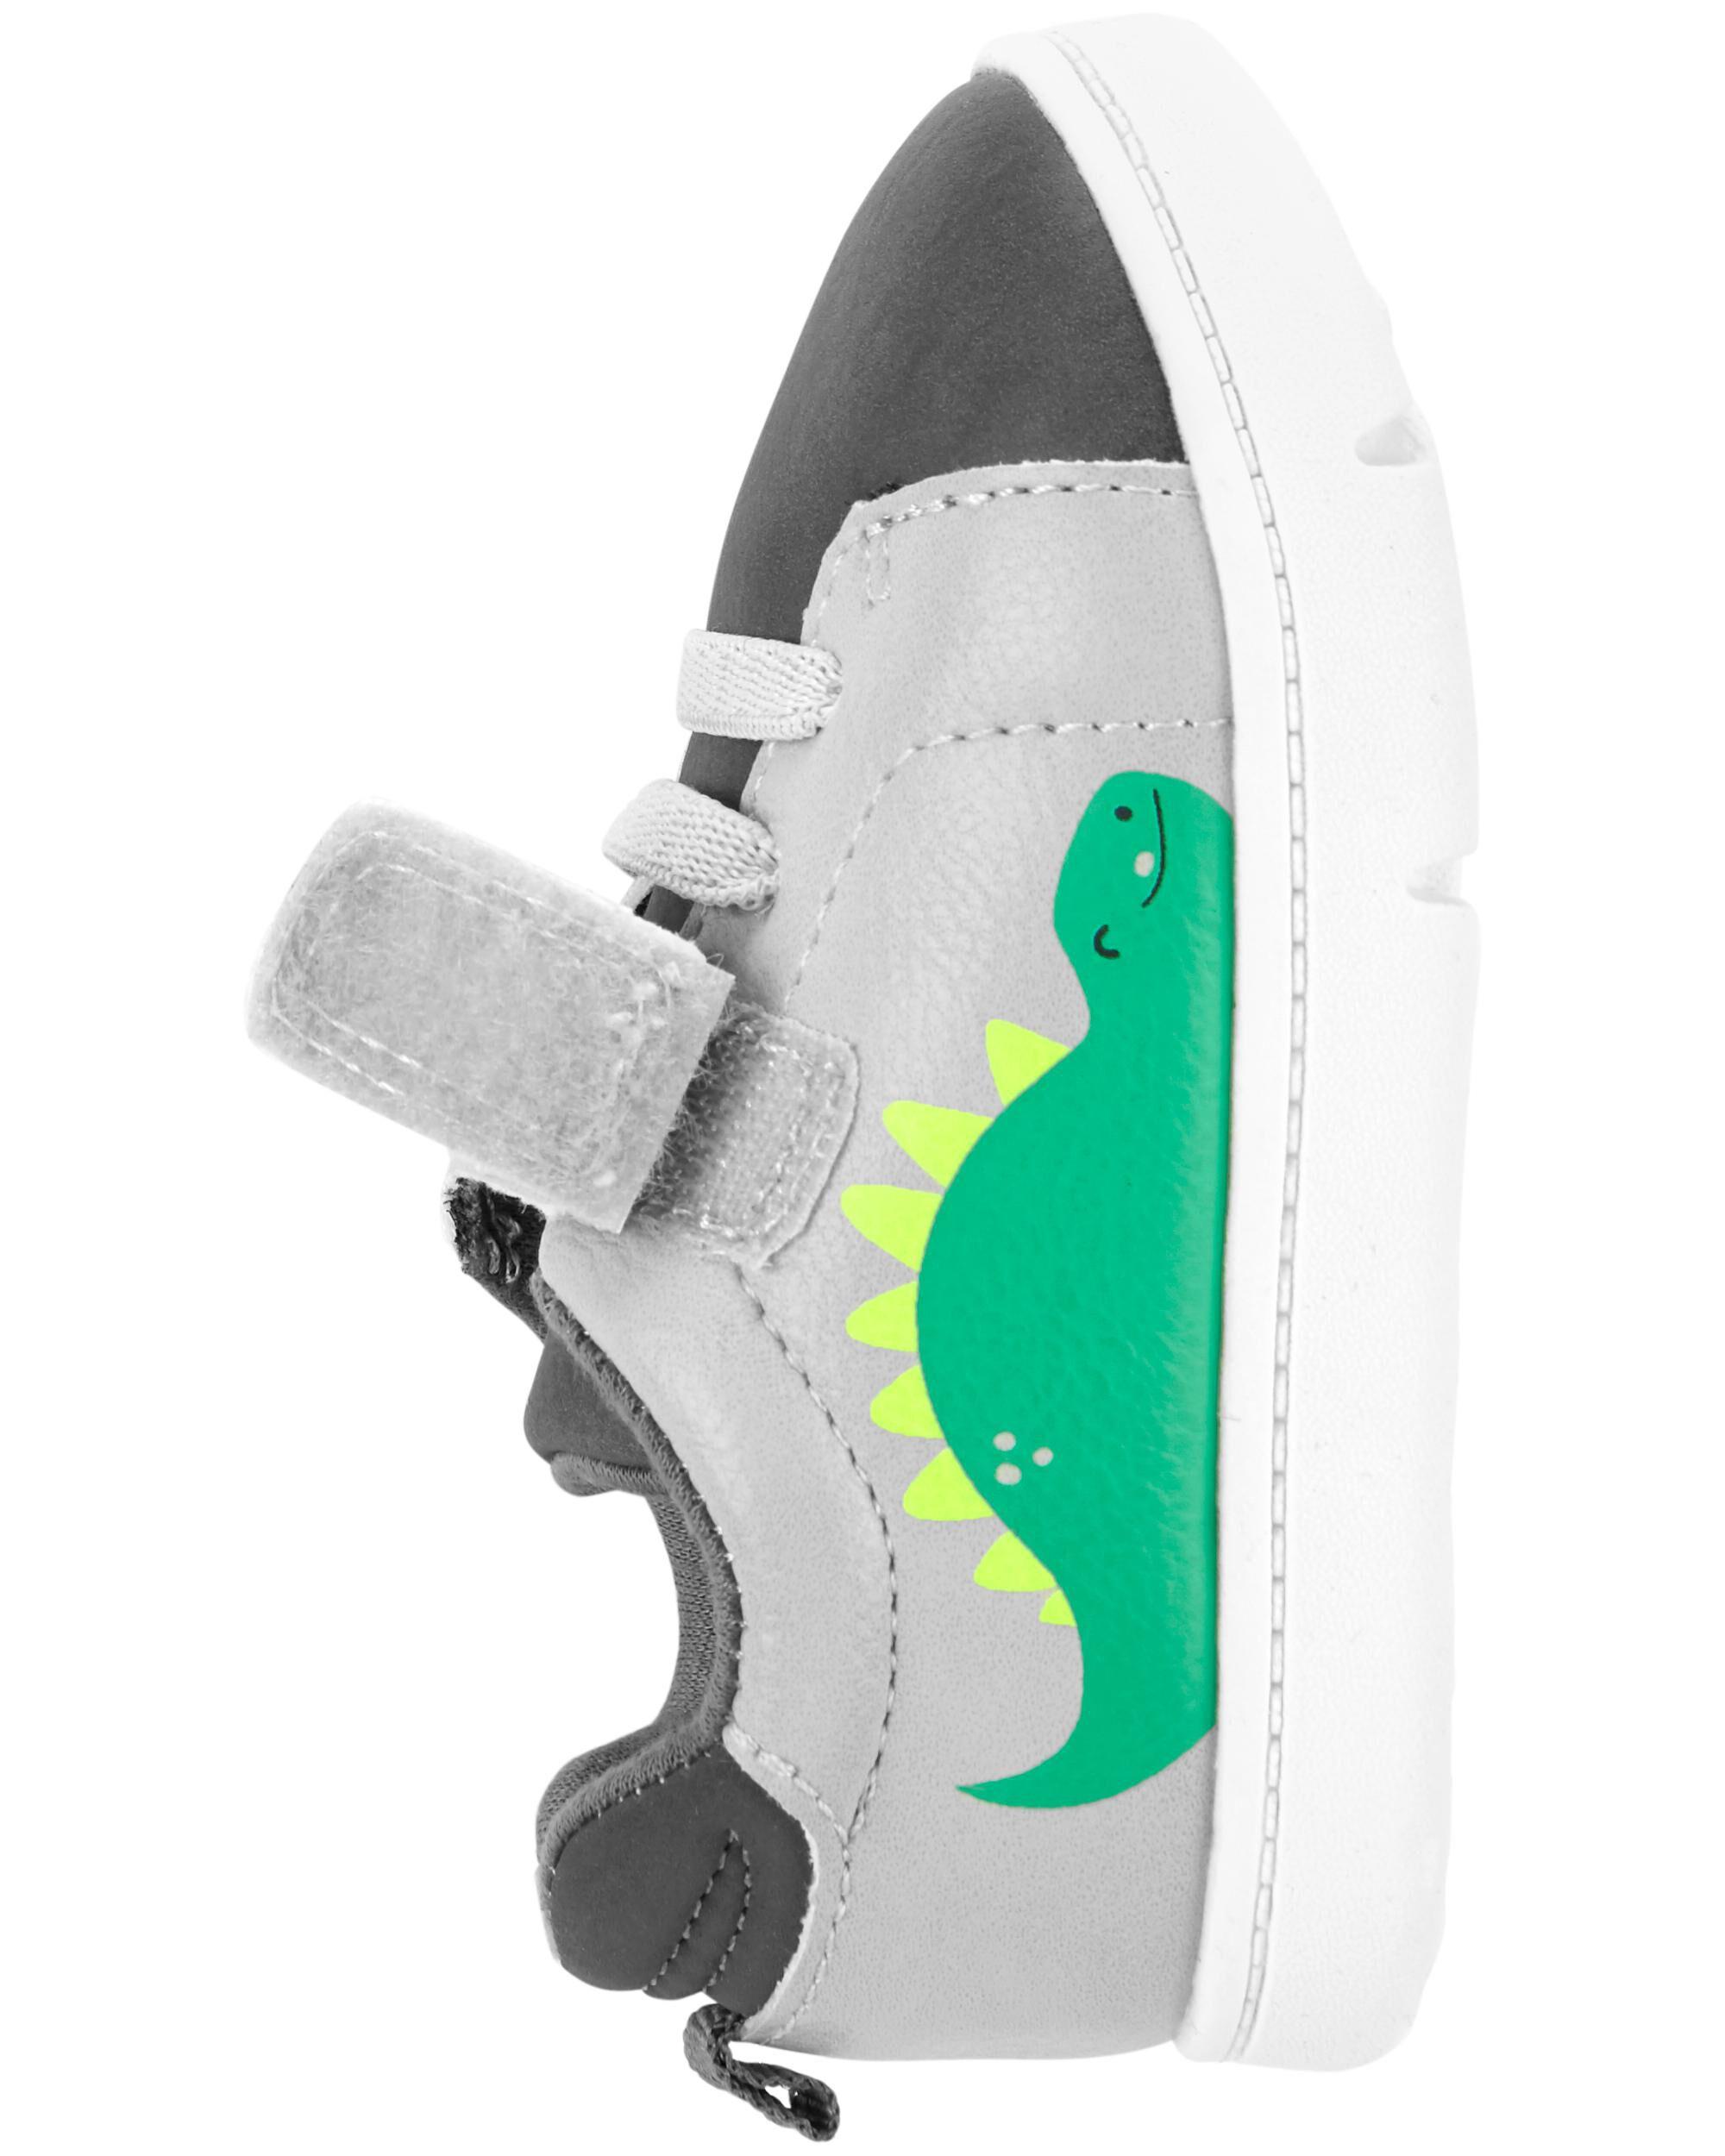 carter's dinosaur shoes